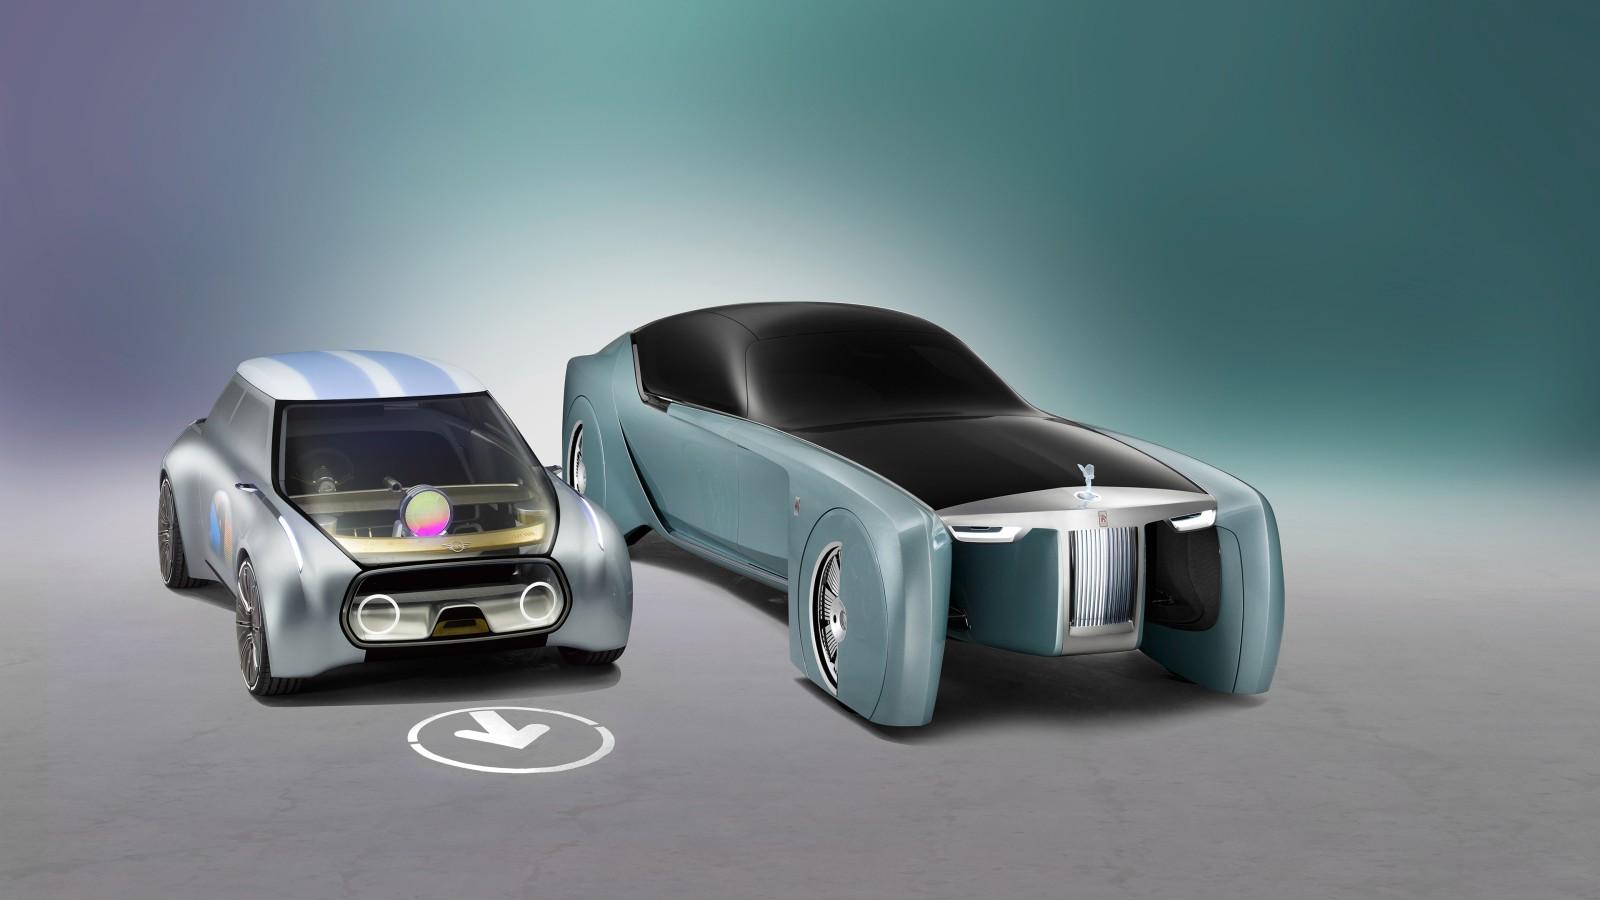 Mini Rolls Royce Vision Next 100 Concept Wallpaper Hd